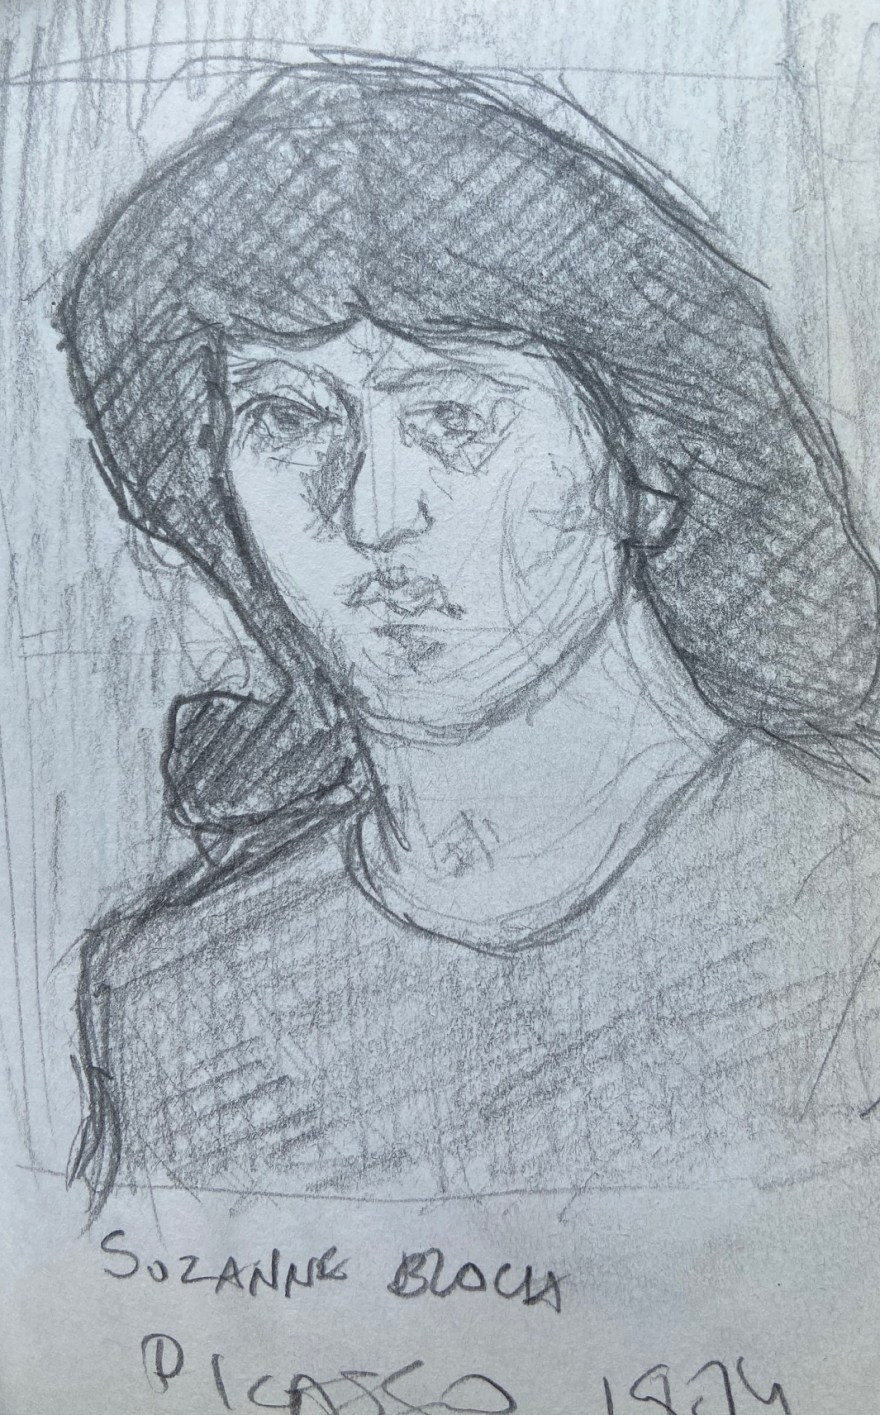 Pablo Picasso, MASP,Justino, lápis nº3, 2016.